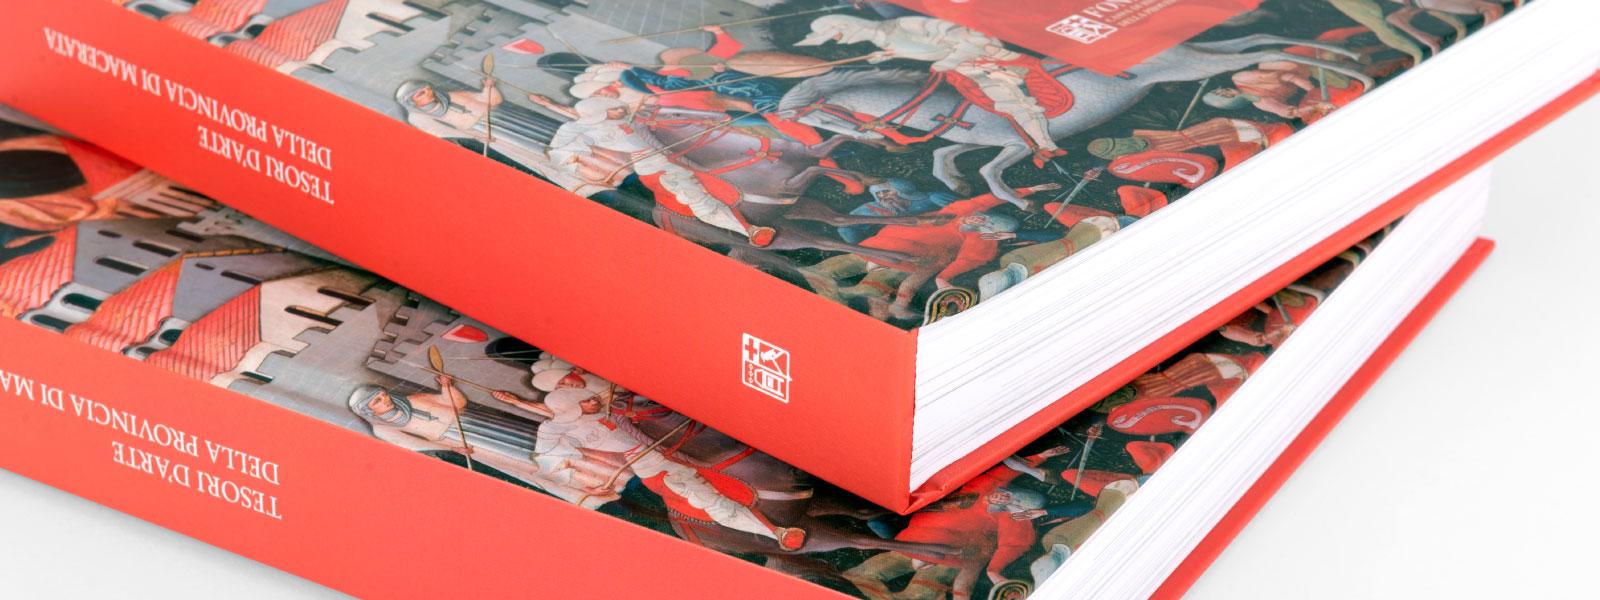 Memphiscom design del libro Tesori d arte della provincia di Macerata